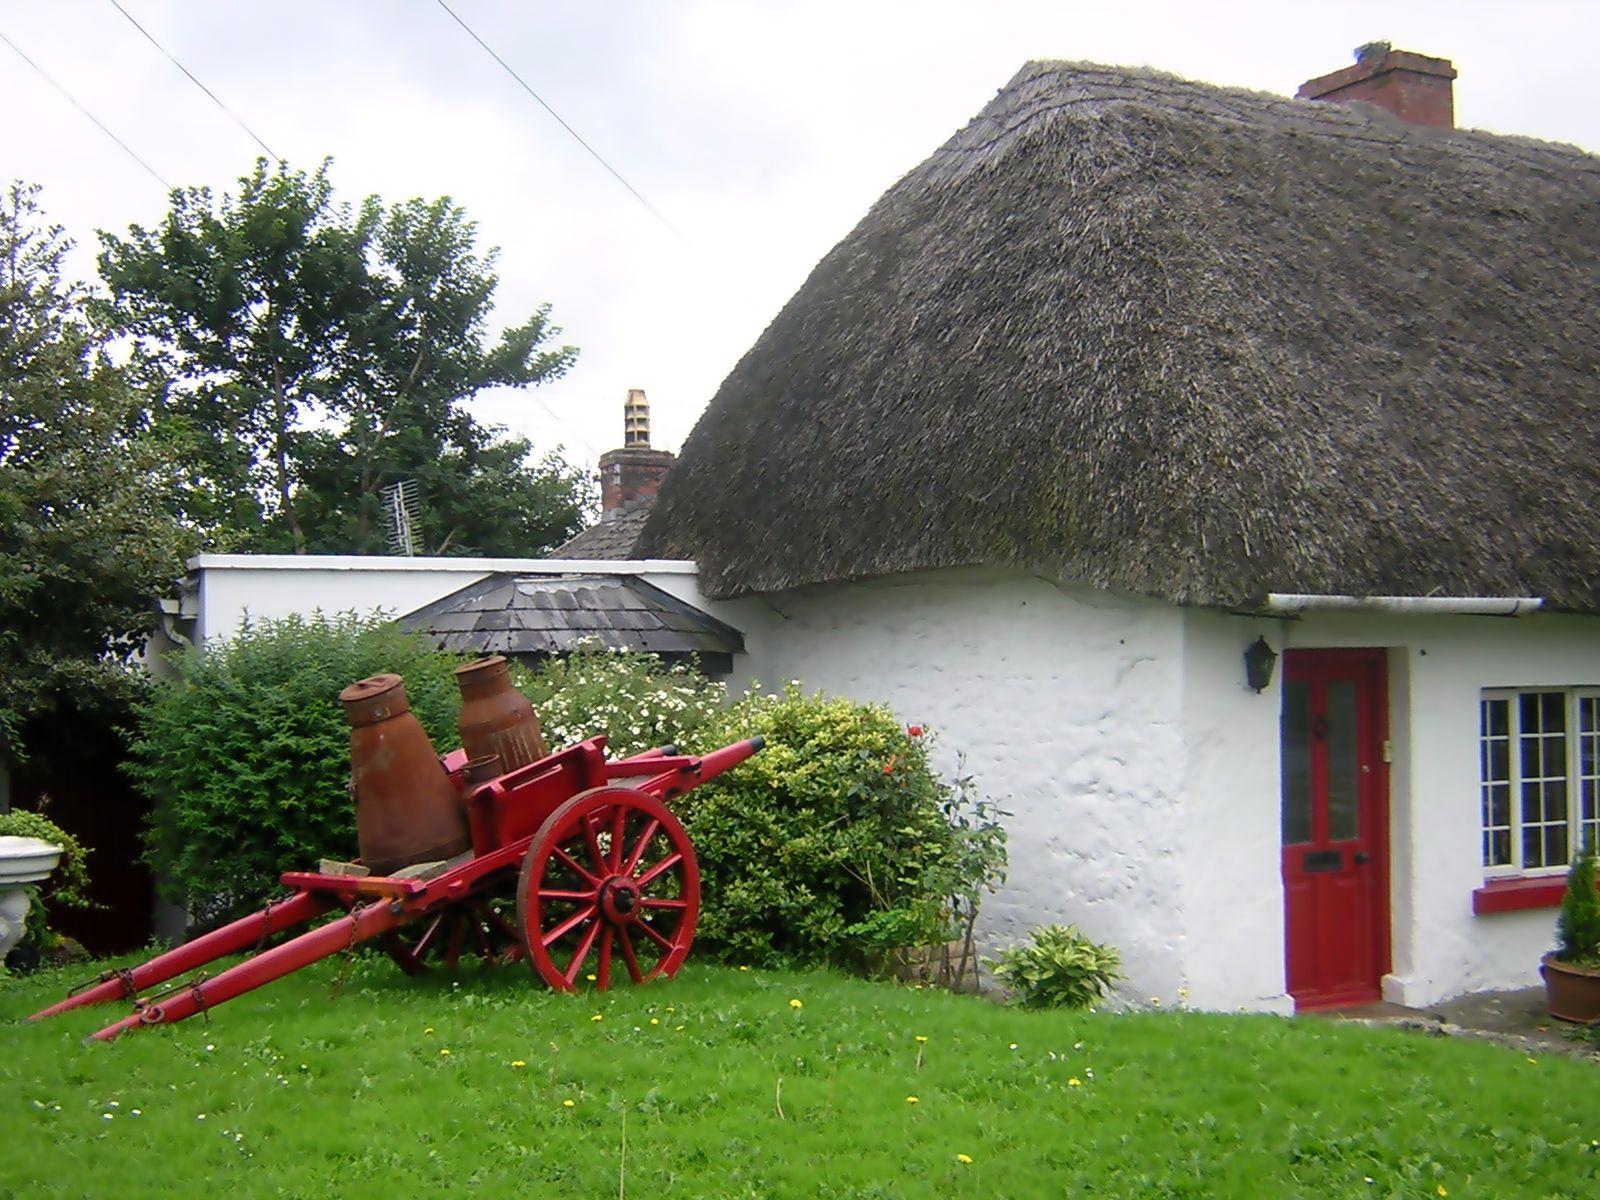 File:Old Ireland.jpg - Wikimedia Commons